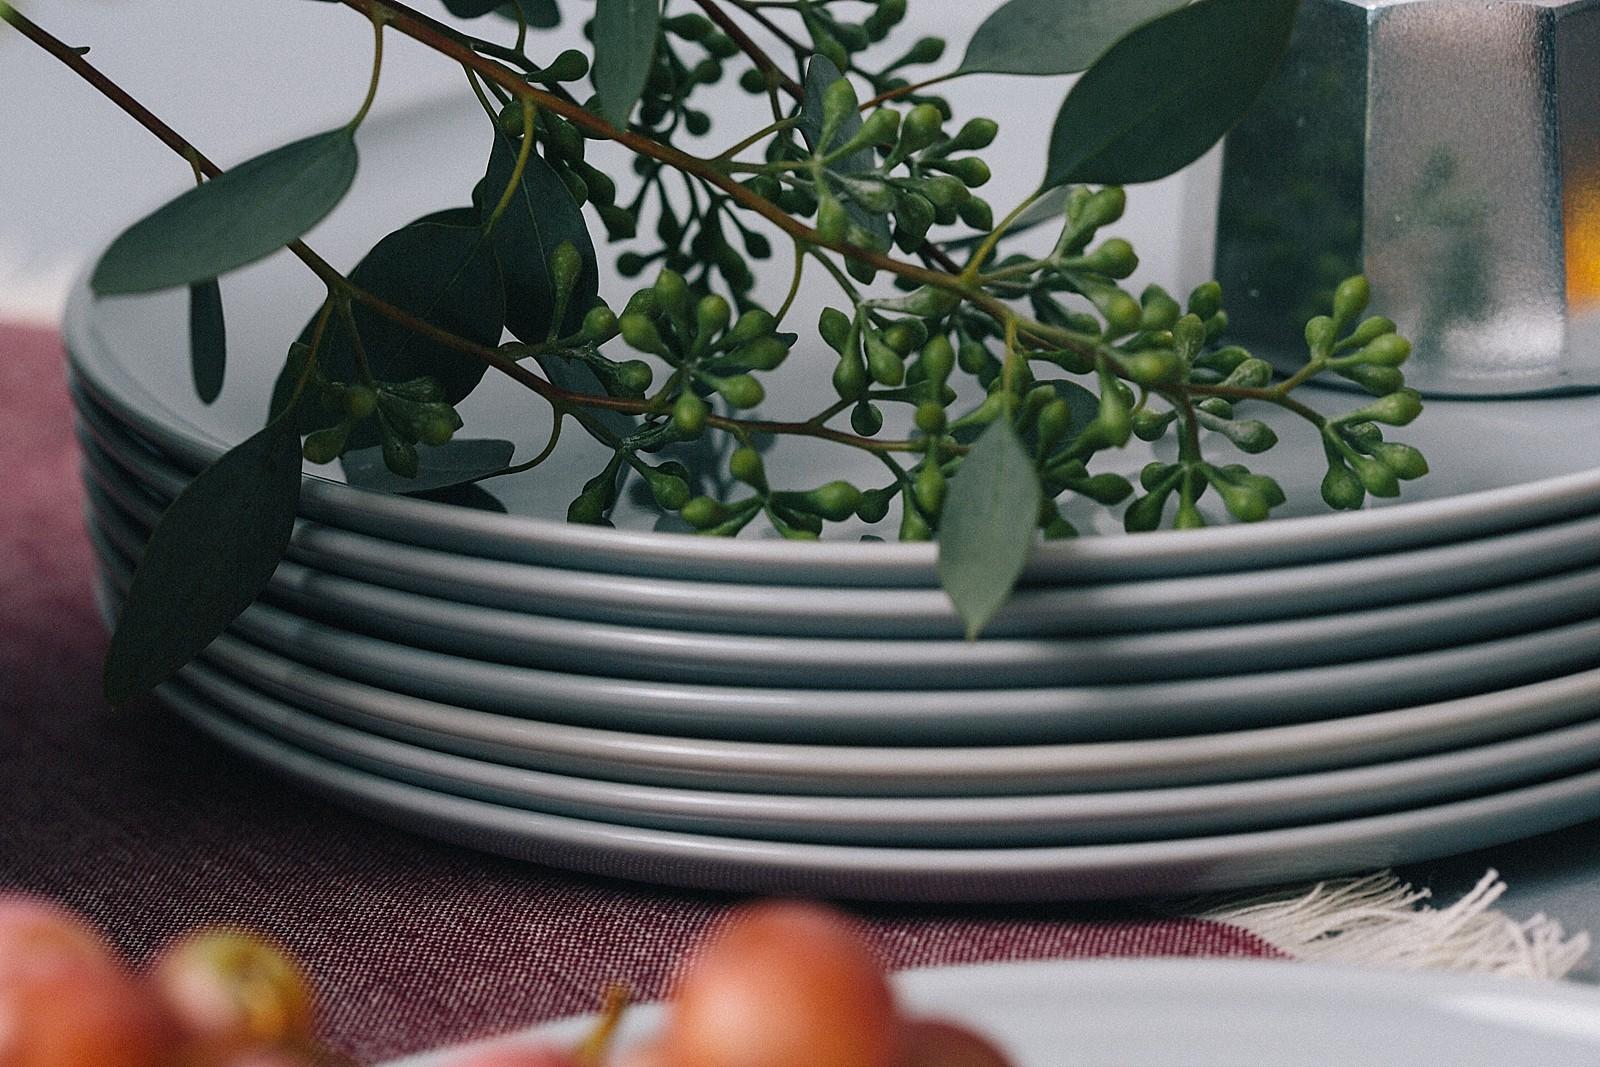 pro-flowers-burke-decor-thanksgiving-christmas-tablescape-idea-fall-popsugar-must-have-box-lifestyle-blogger-diana-elizabeth-blog-2177